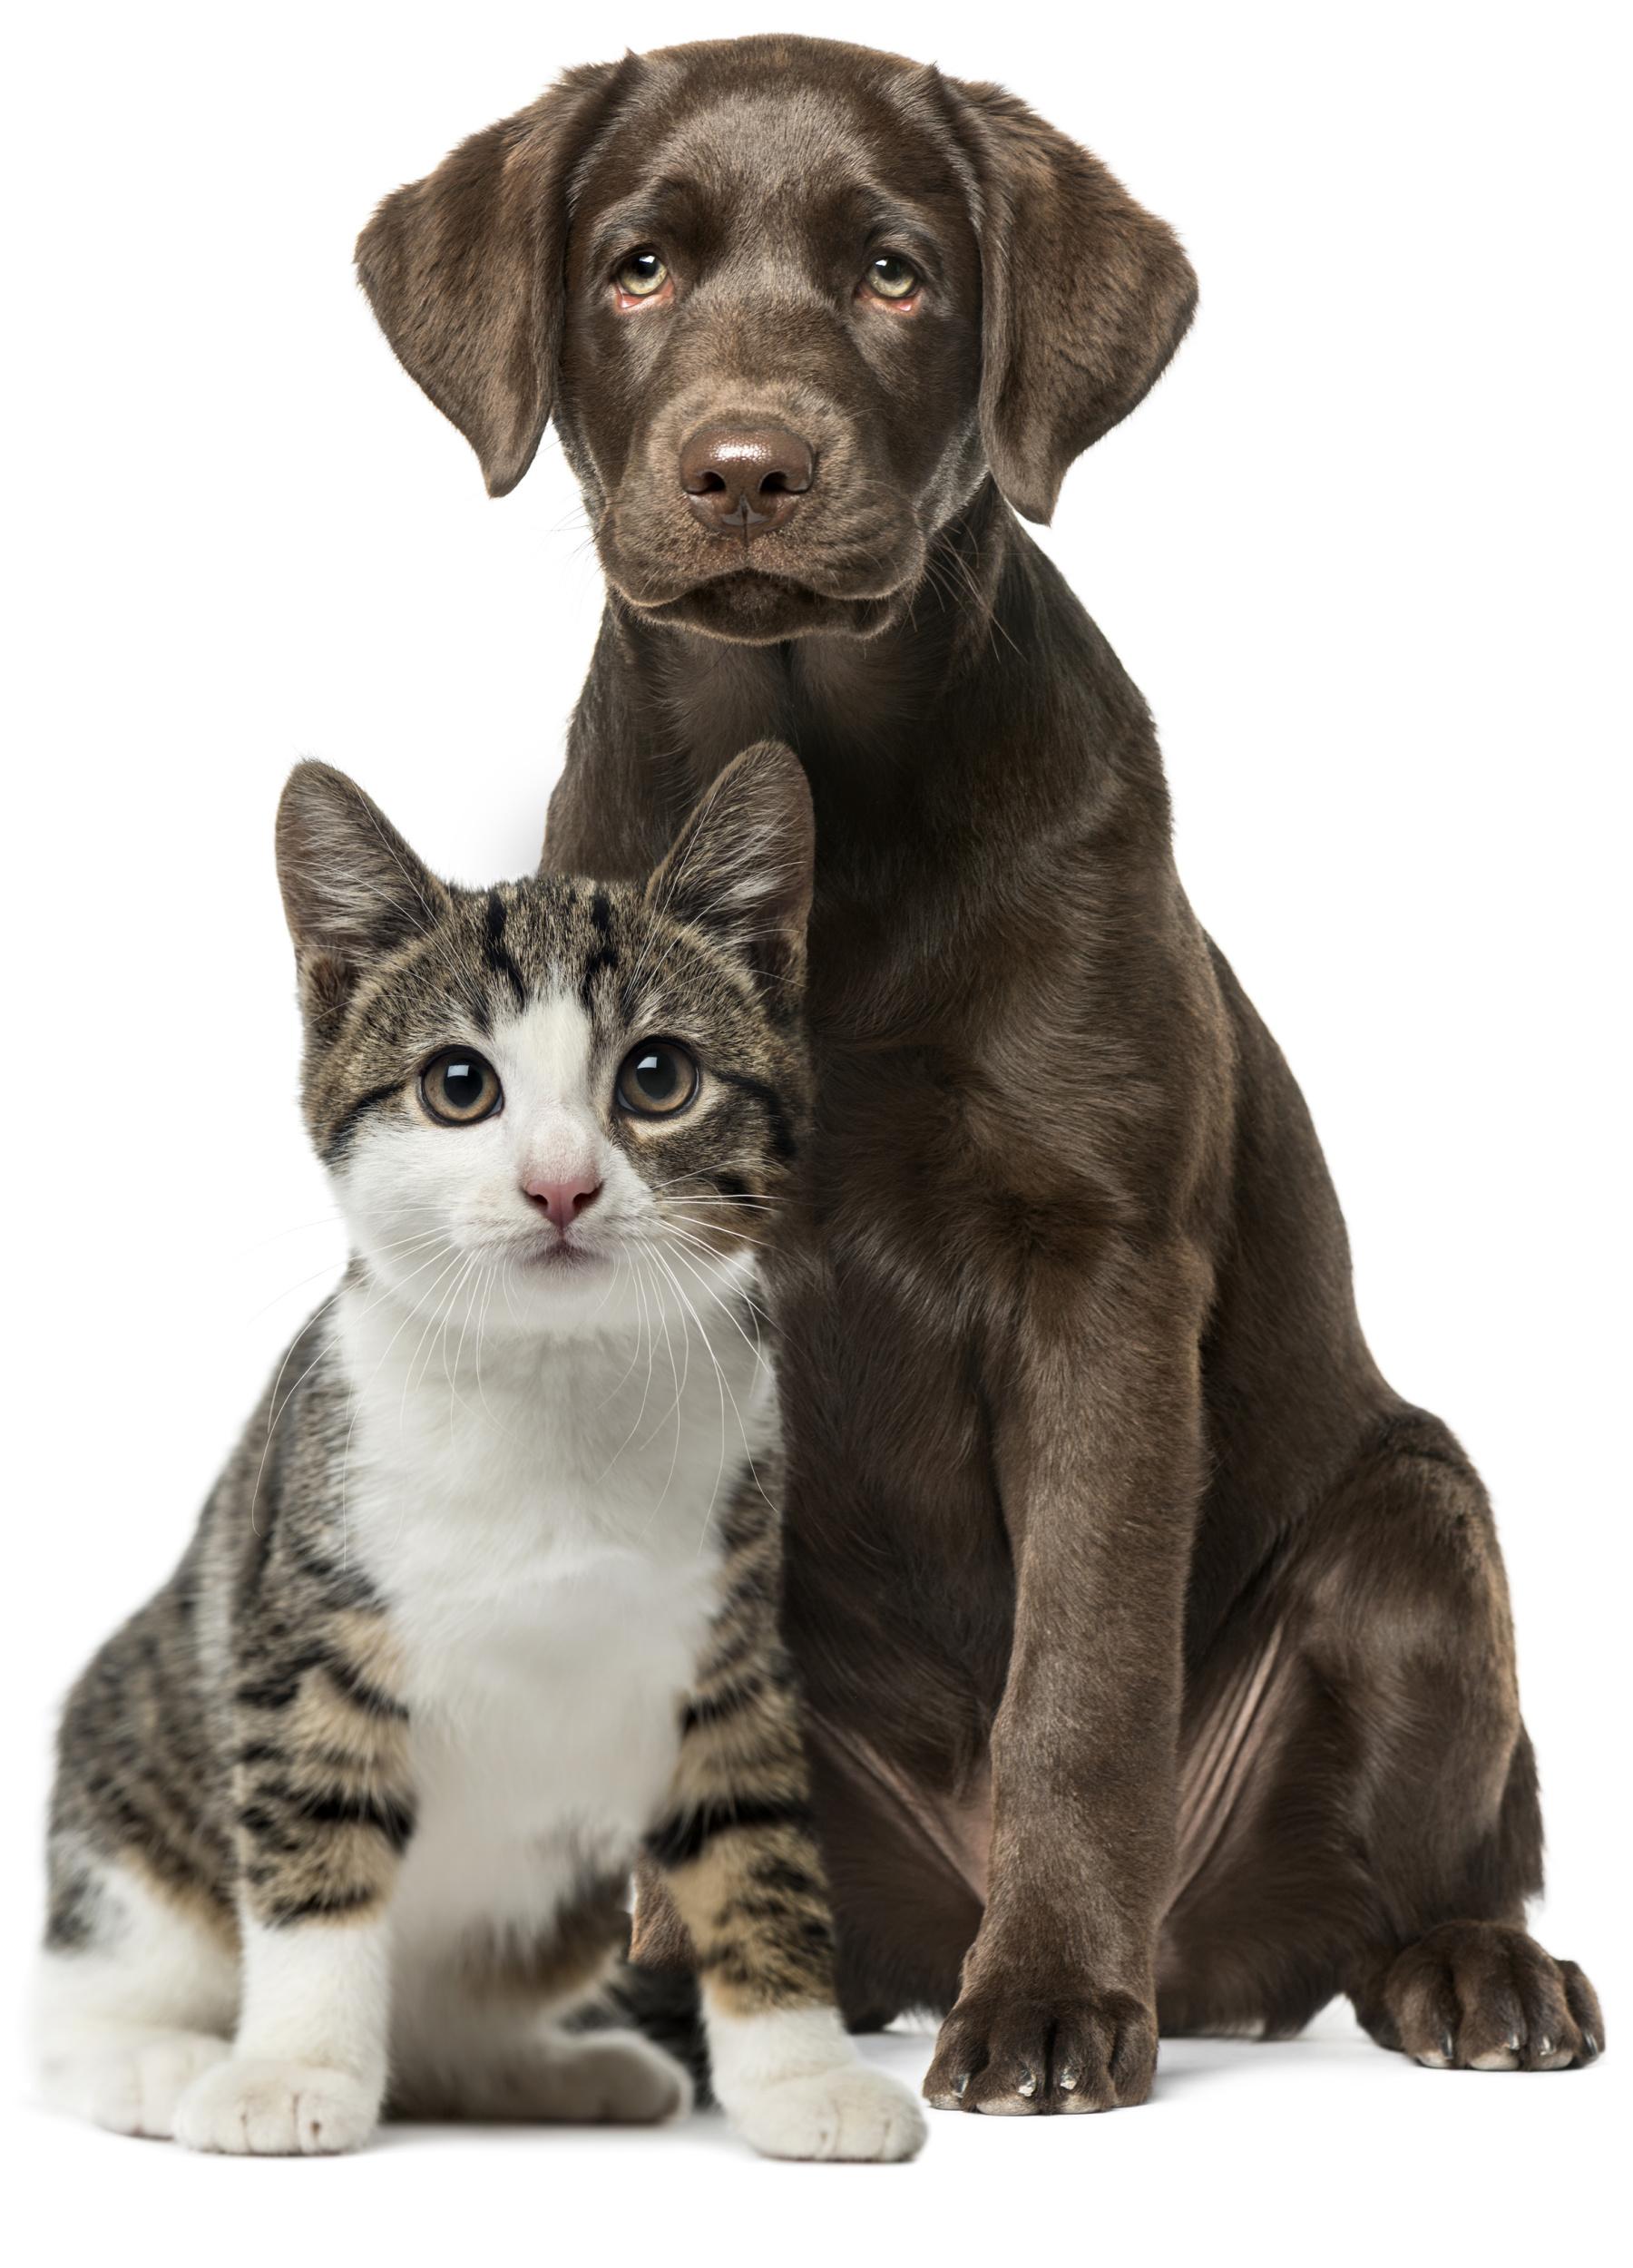 Lab dog and cat